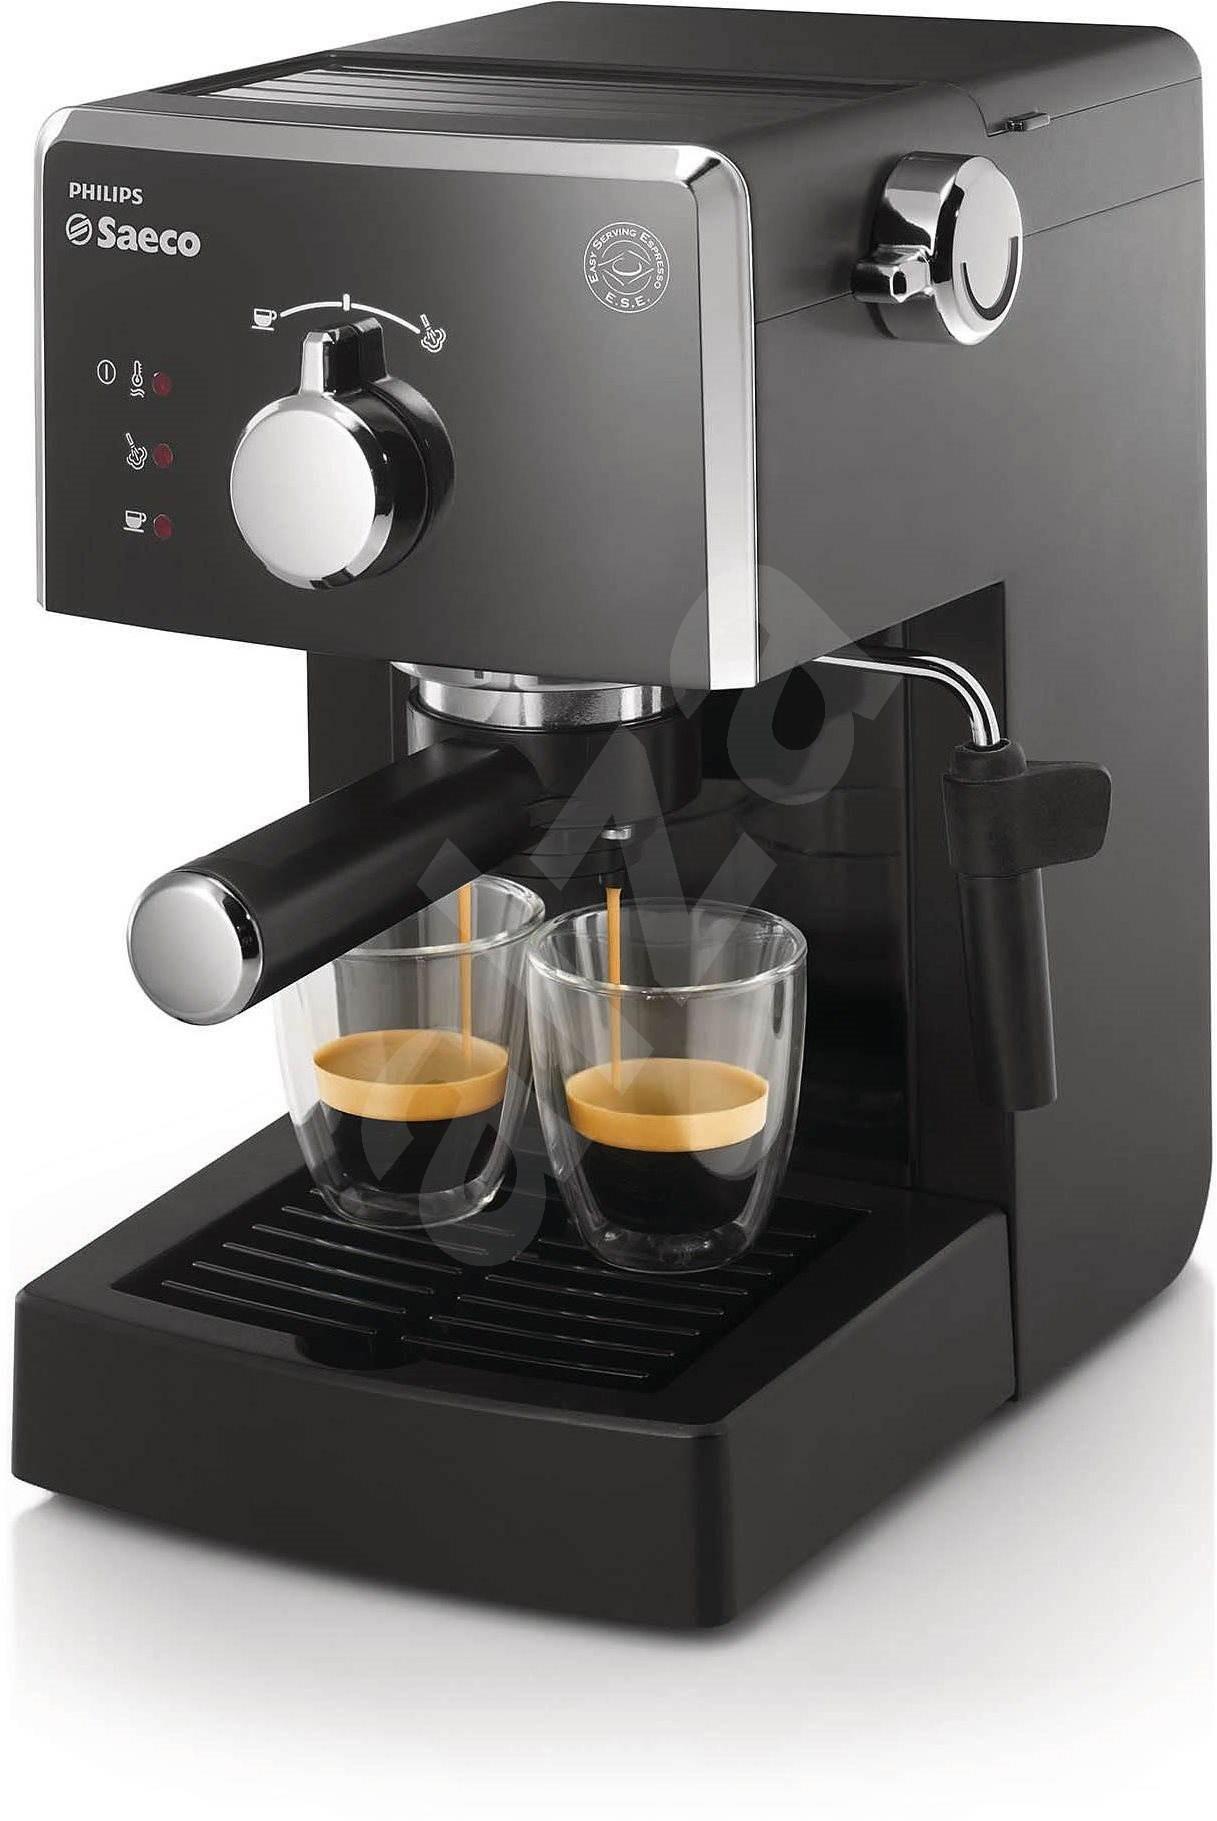 saeco poemia espresso machine manual